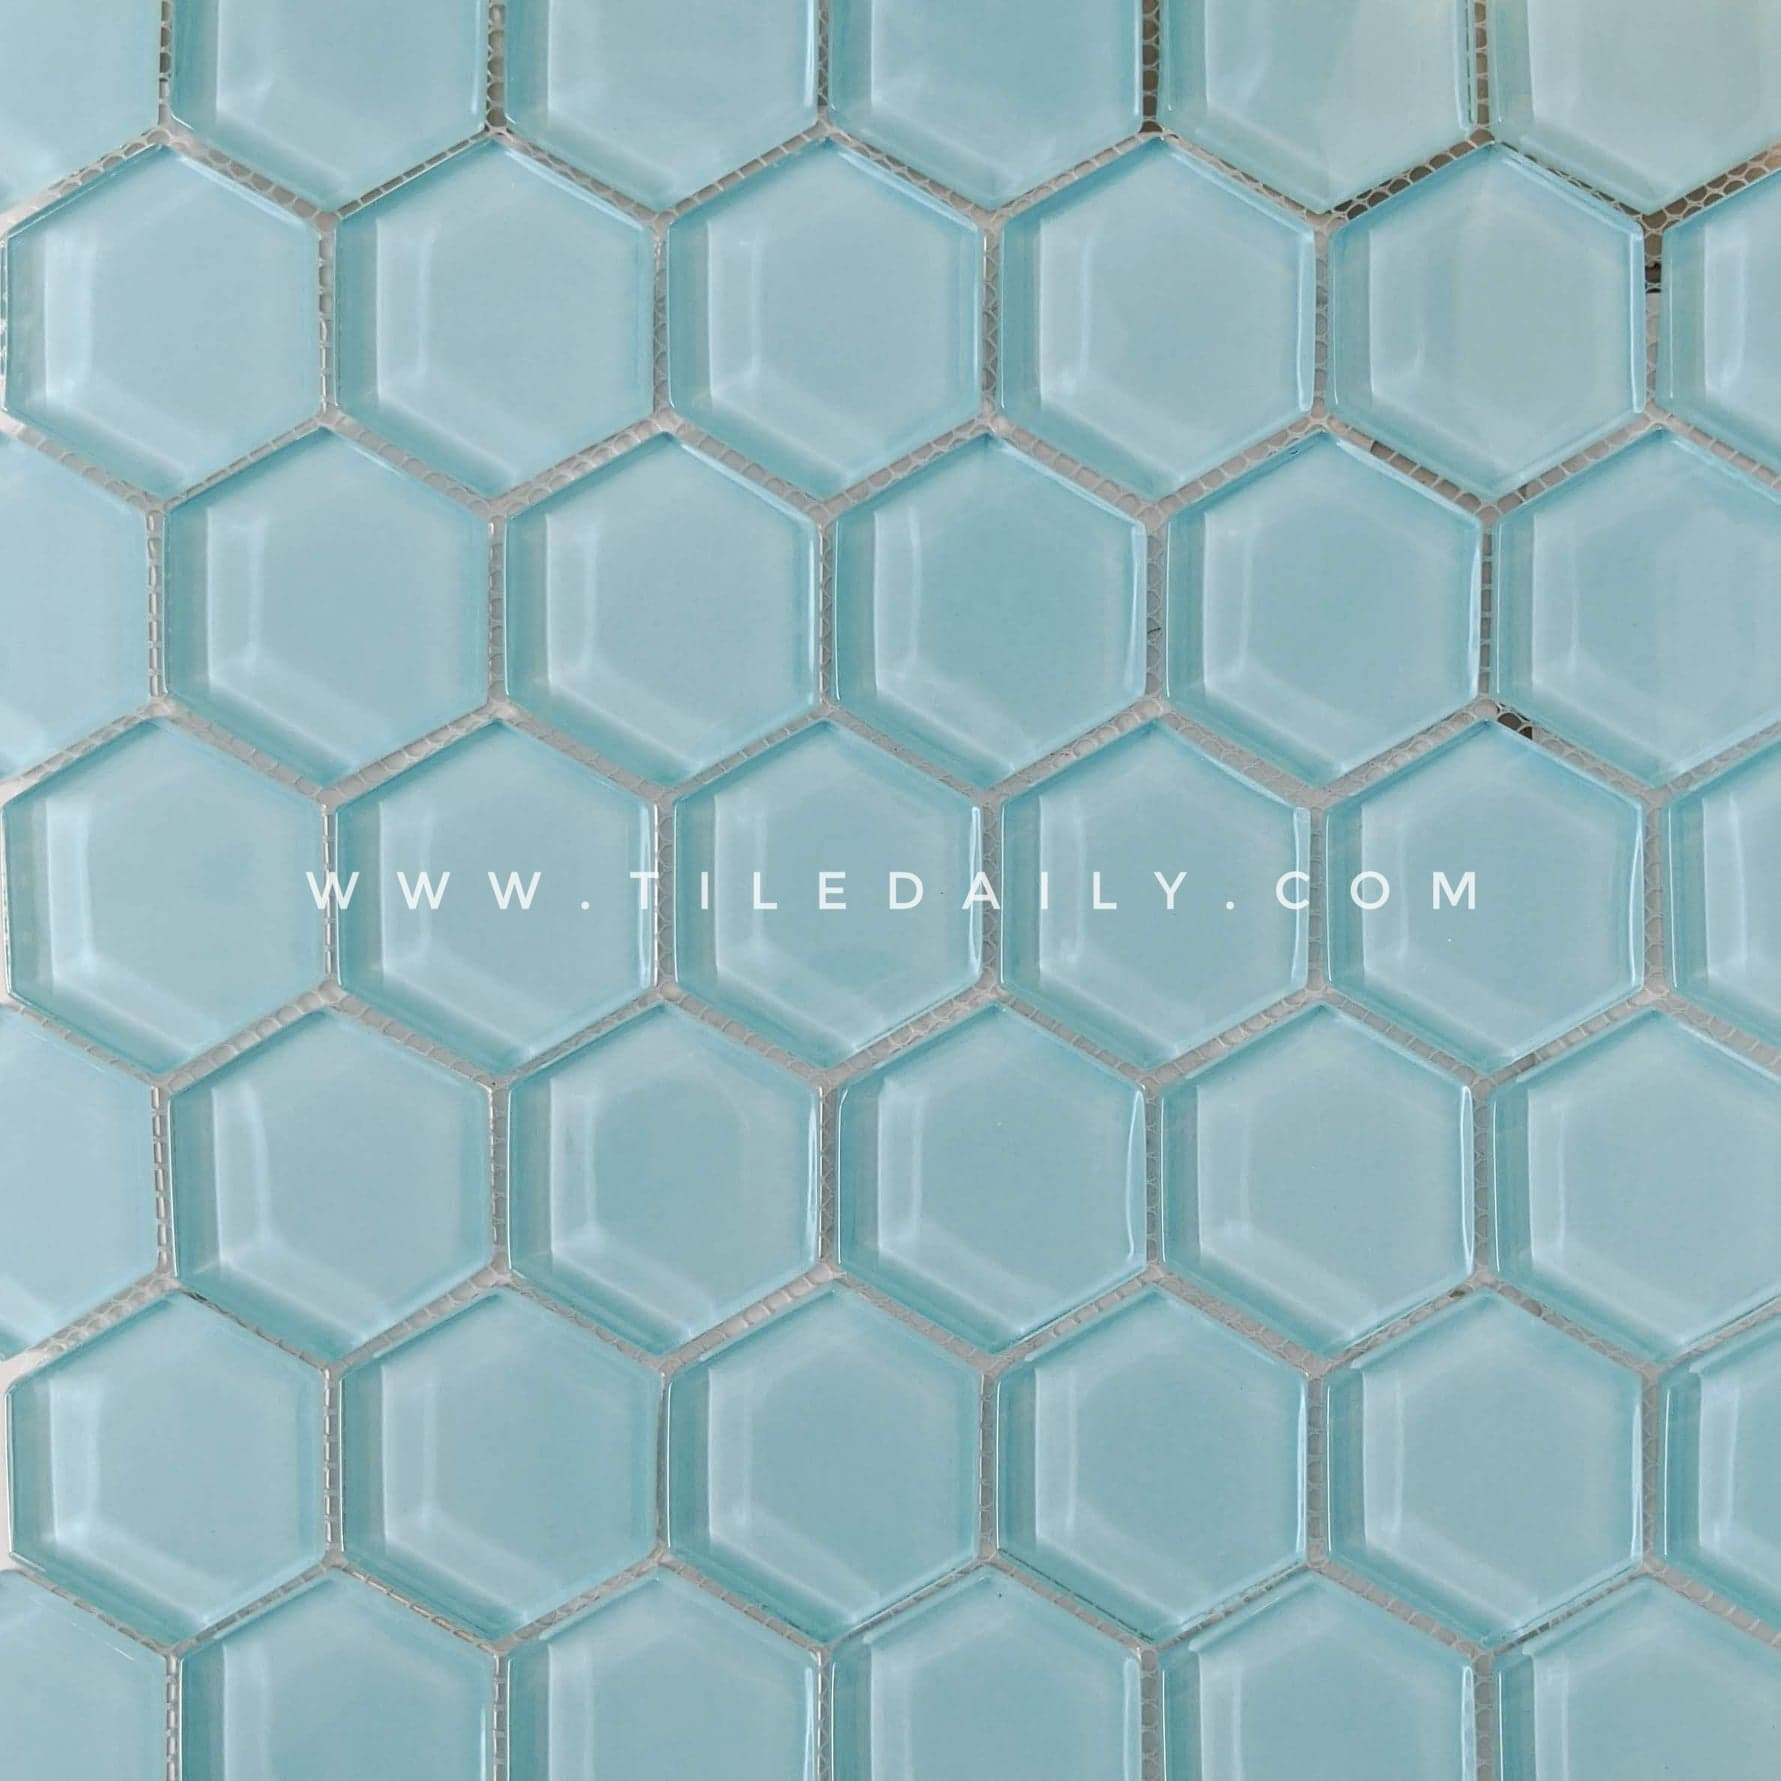 Hexagon Glass Mosaic Tiledaily